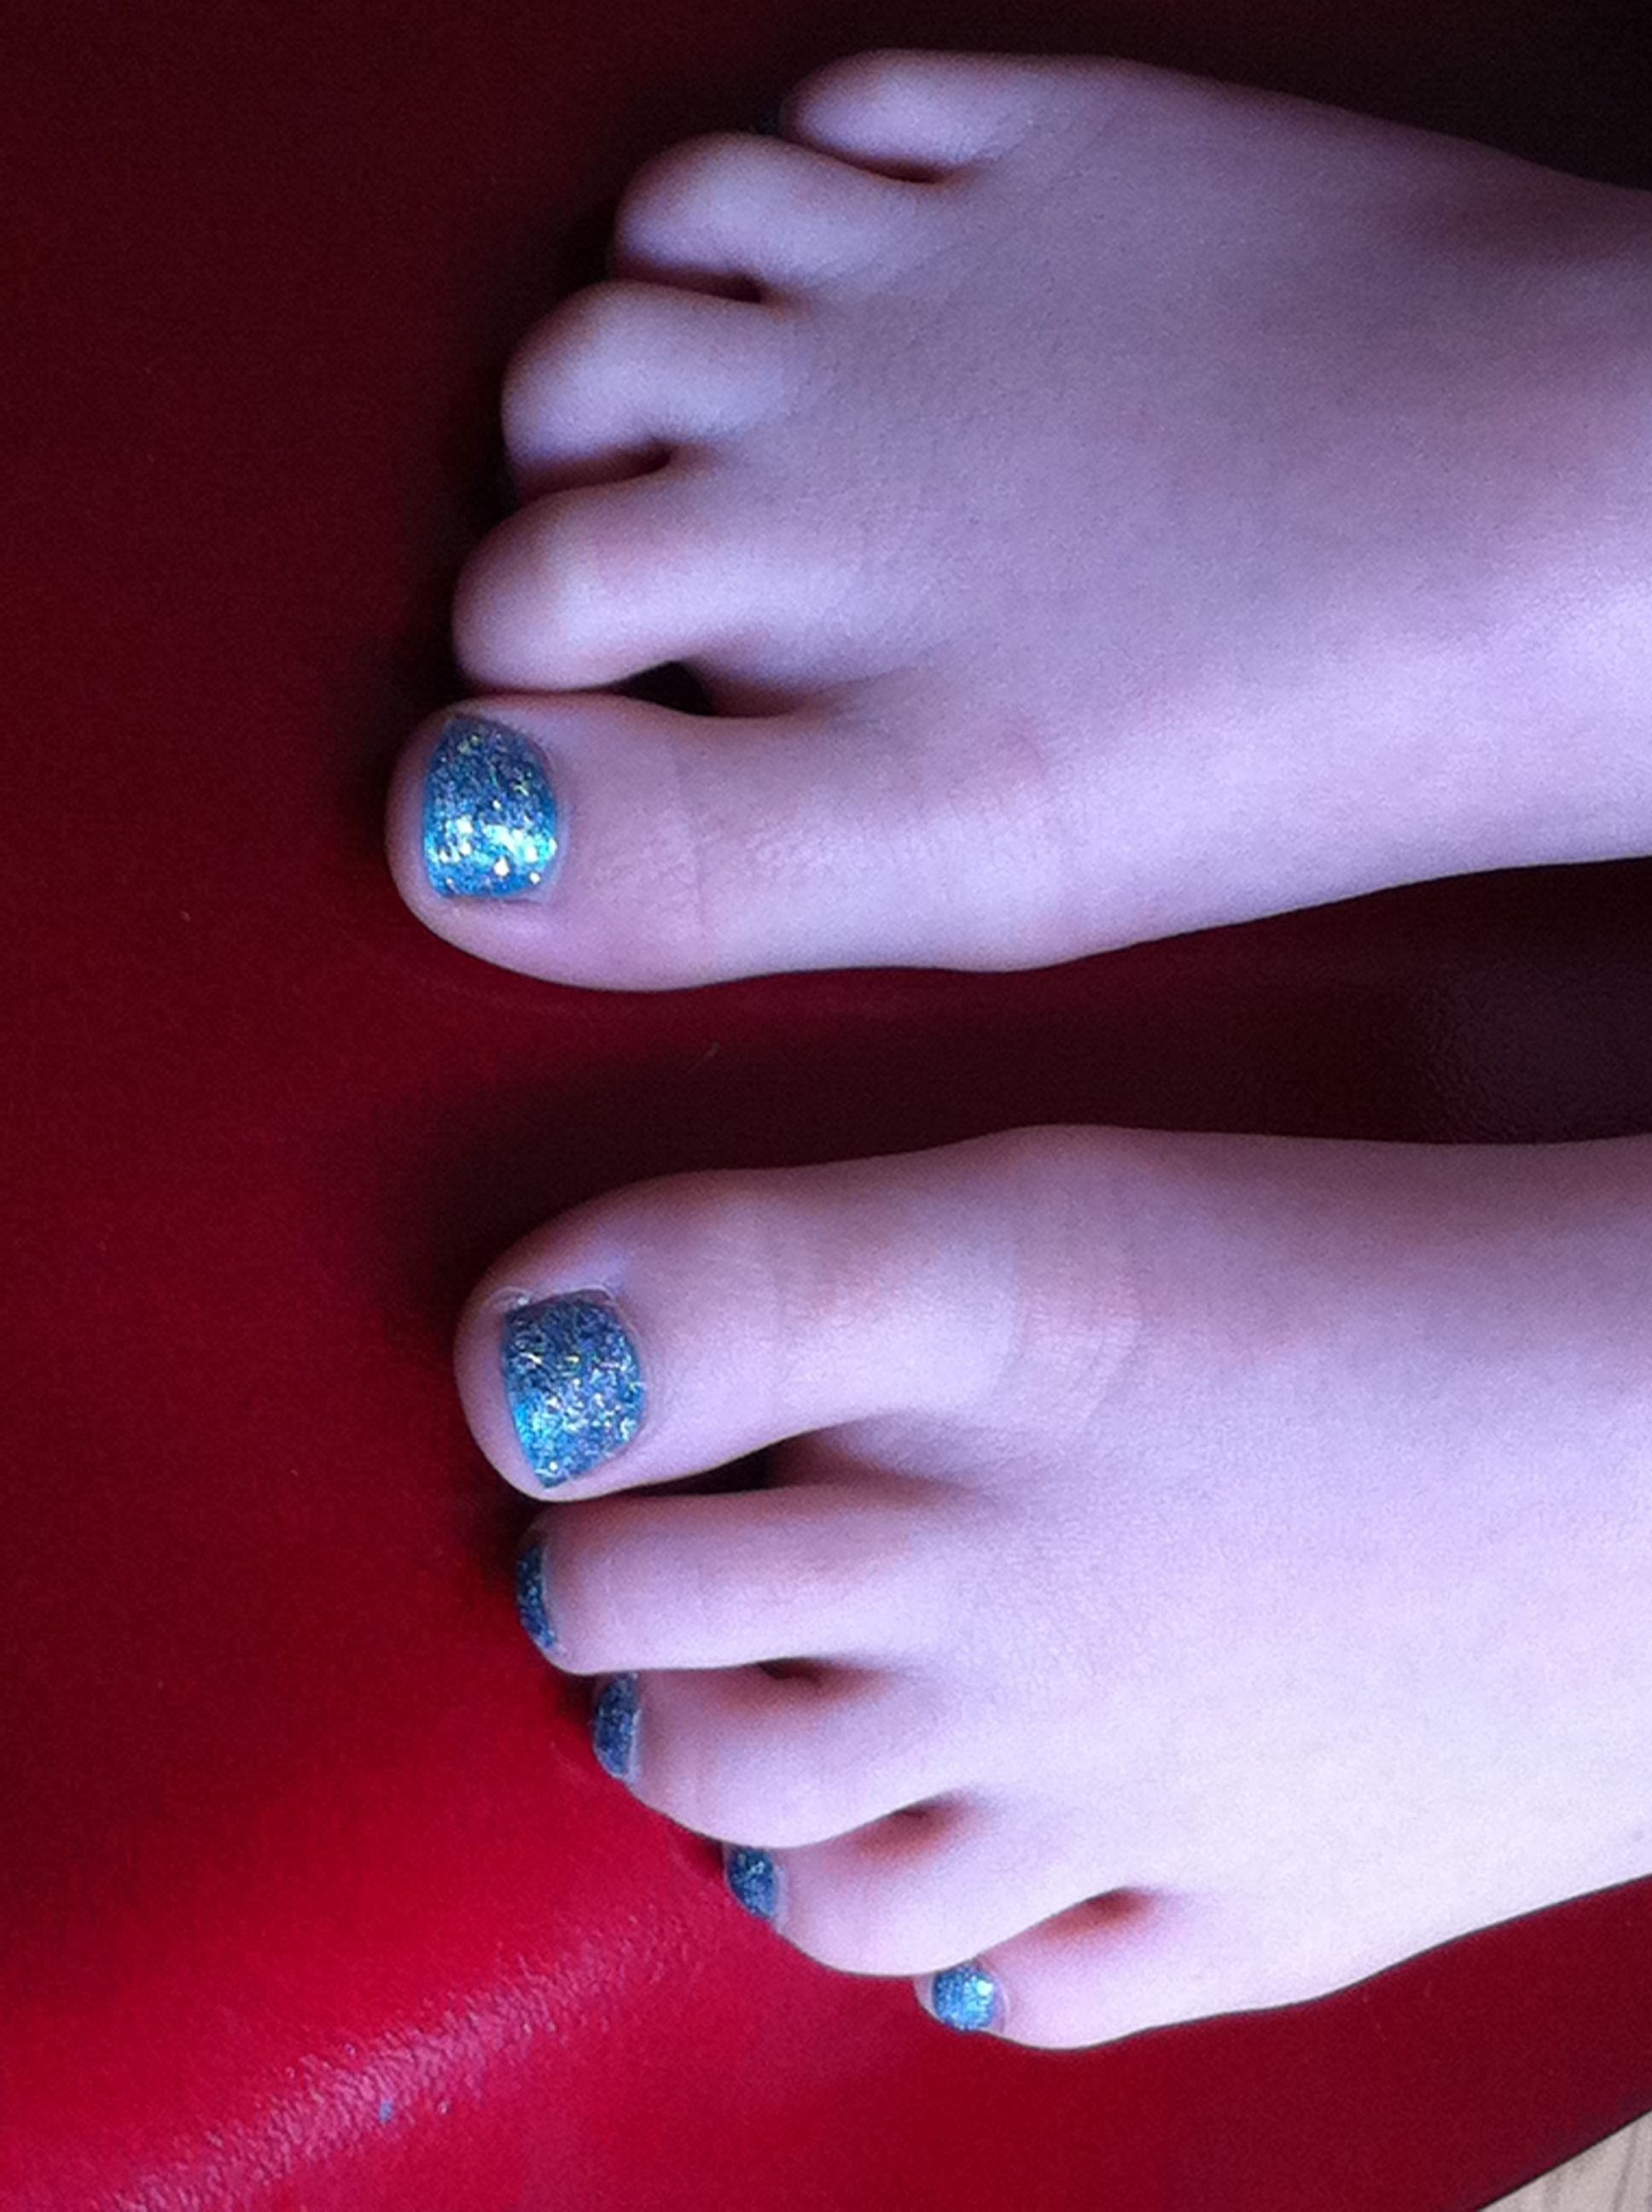 Little rockstar toes!